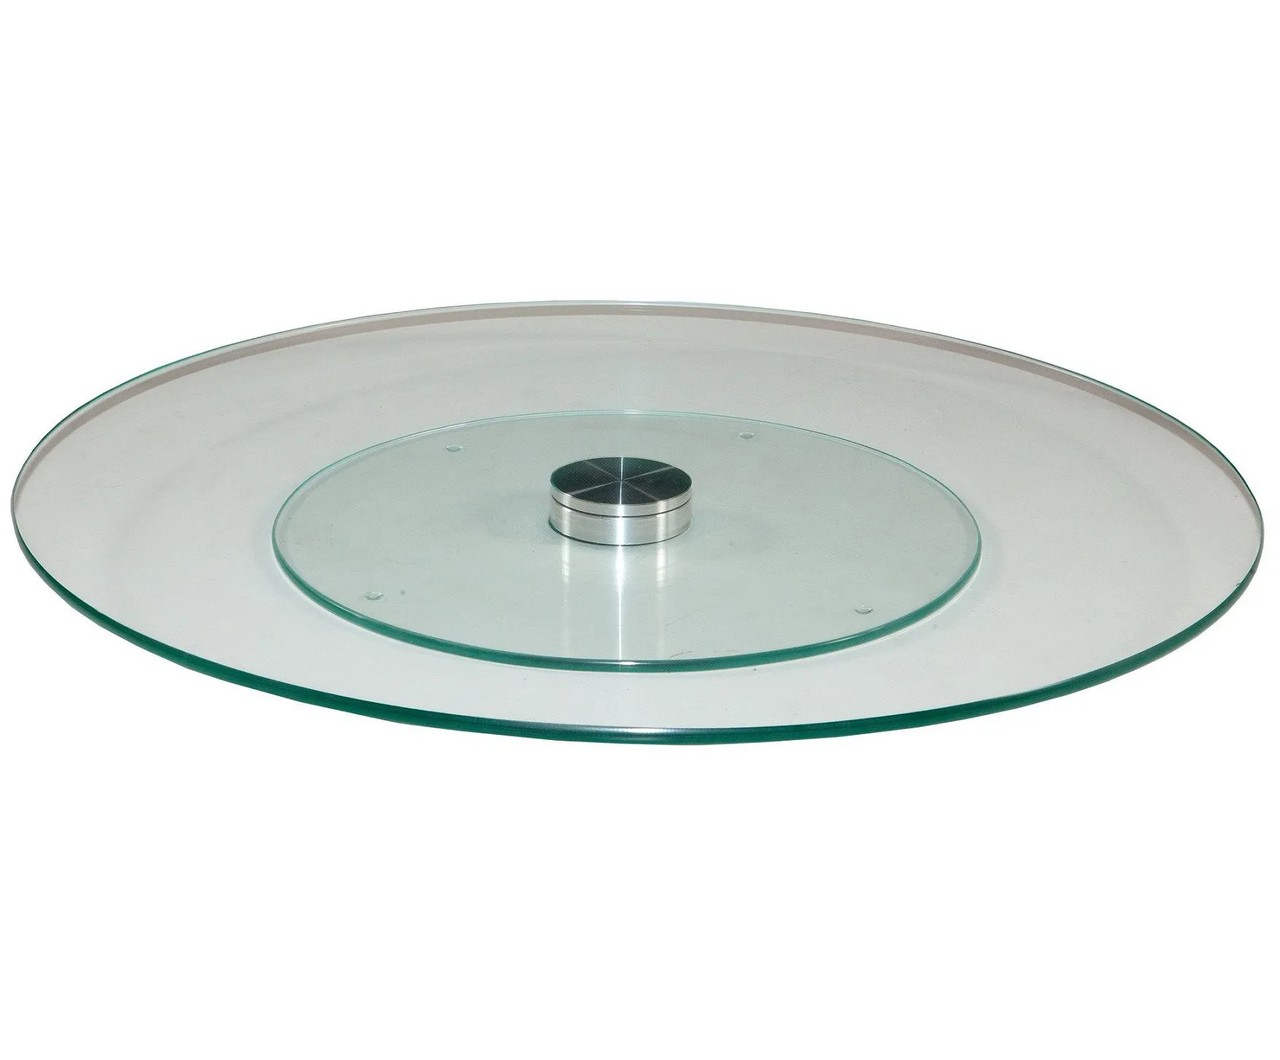 Centro de mesa Prato Giratório de 80 cm incolor